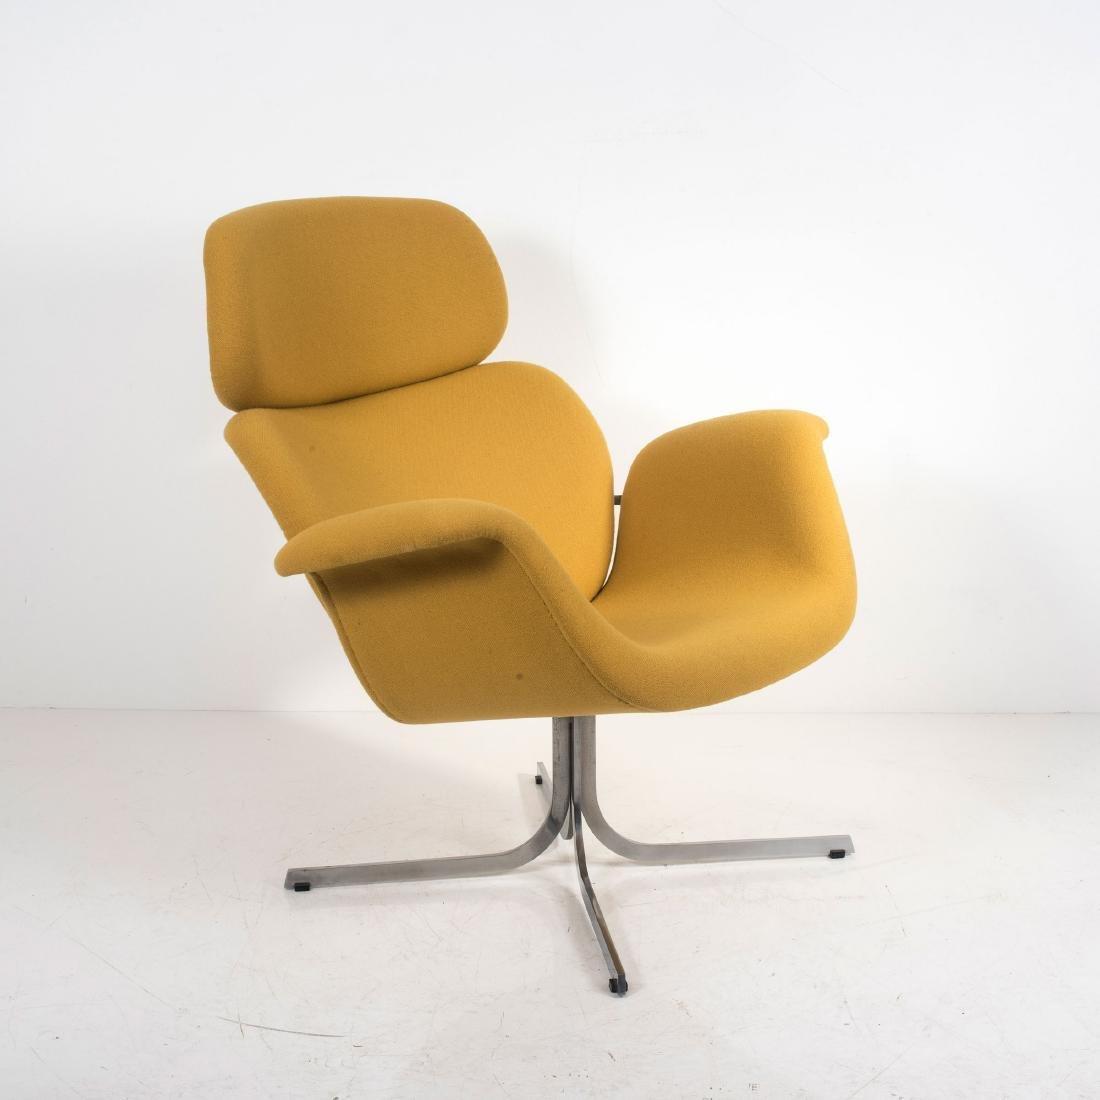 'F 545' - 'Big Tulip' easy chair, 1959 - 3